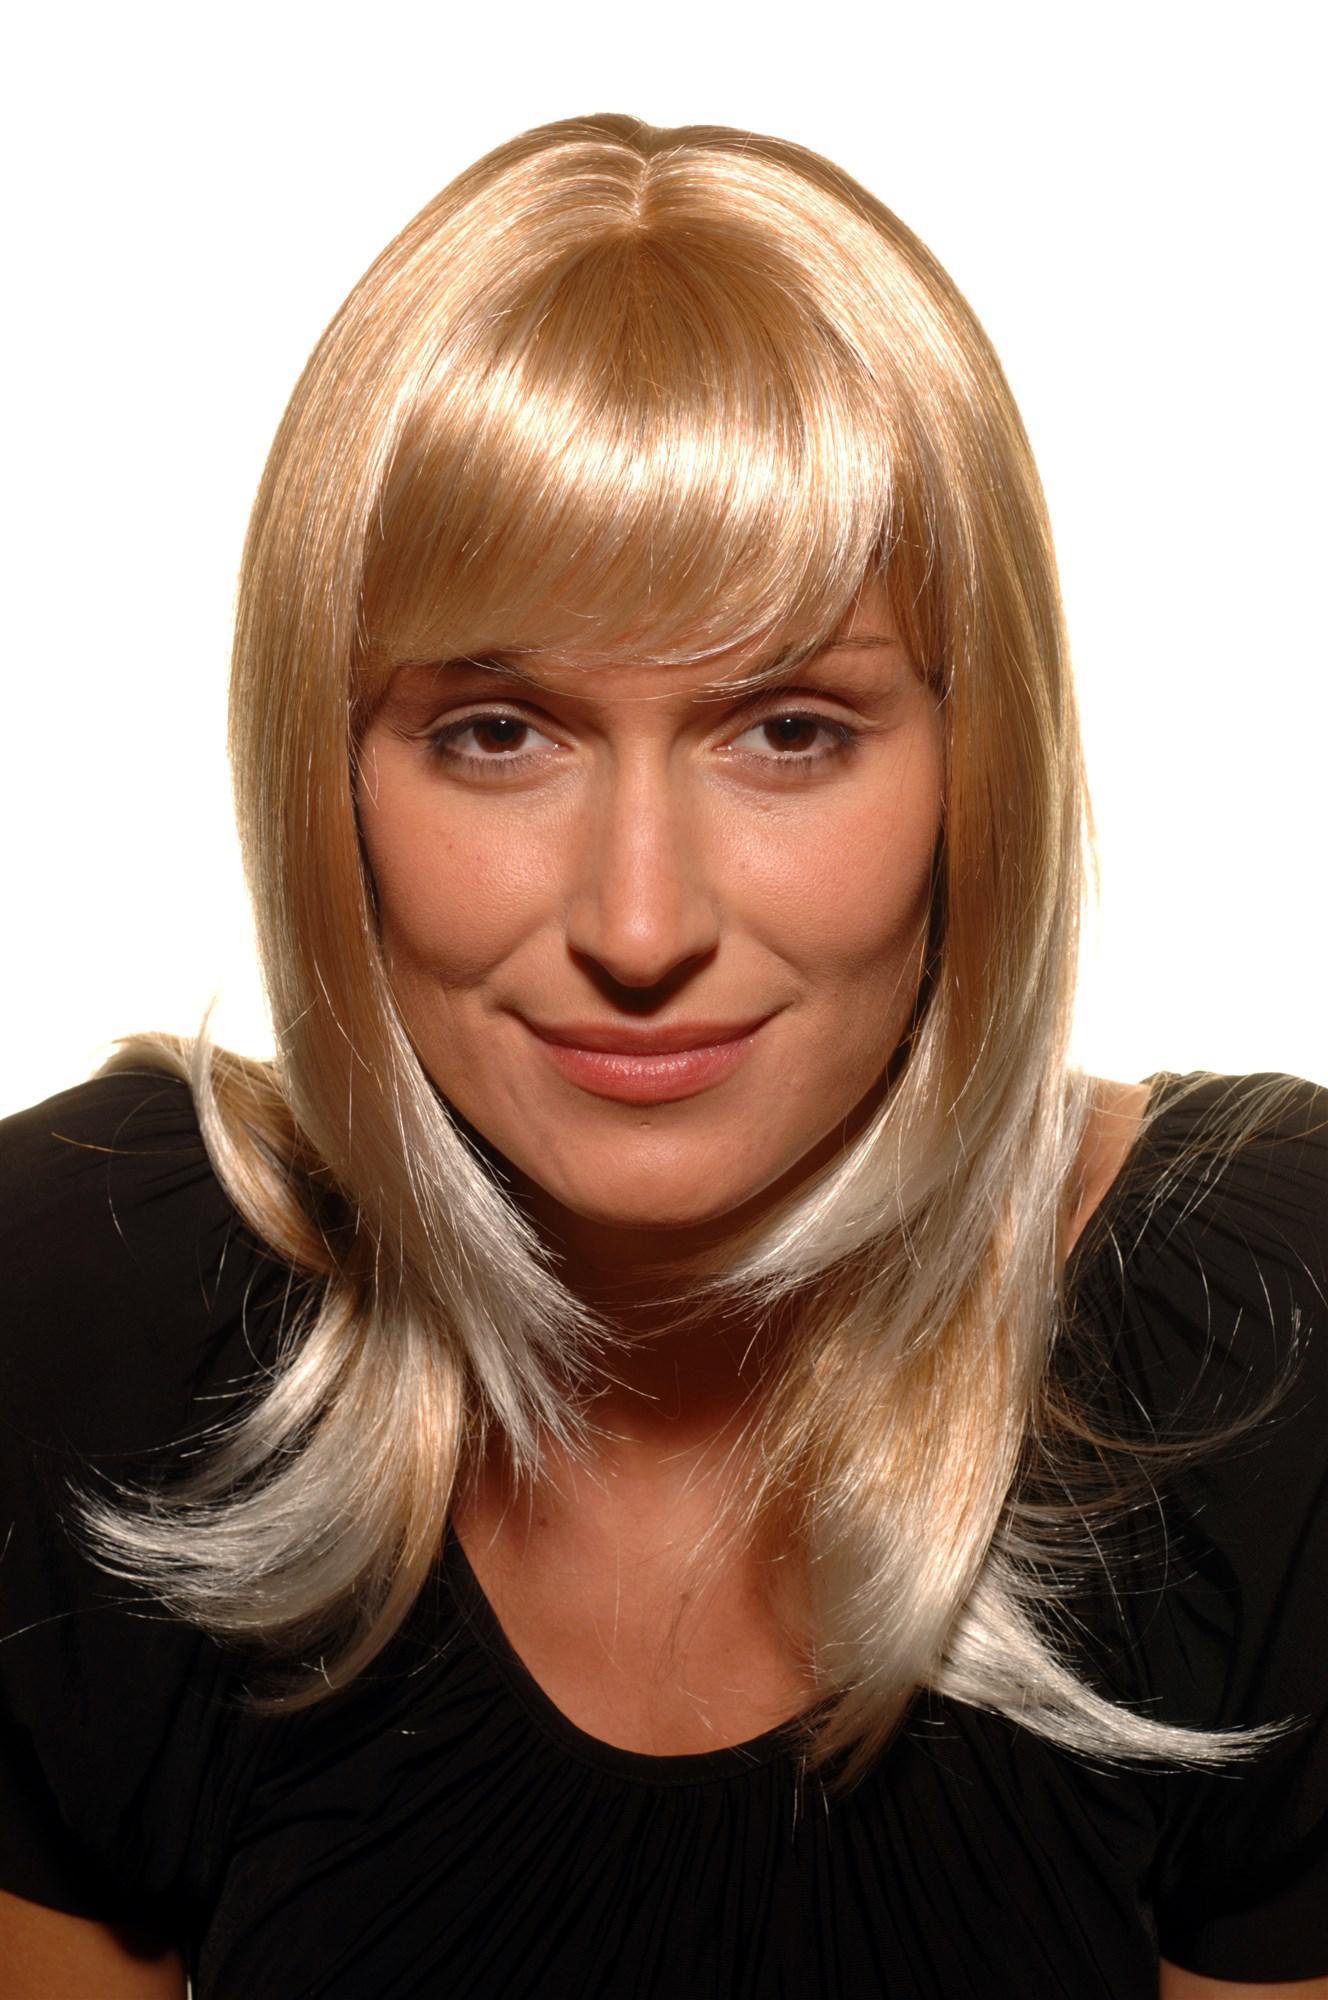 Damen Percke BLOND edel Haarschnitt glatt schulterlang Pony 45 cm 300327T613  Kaufen